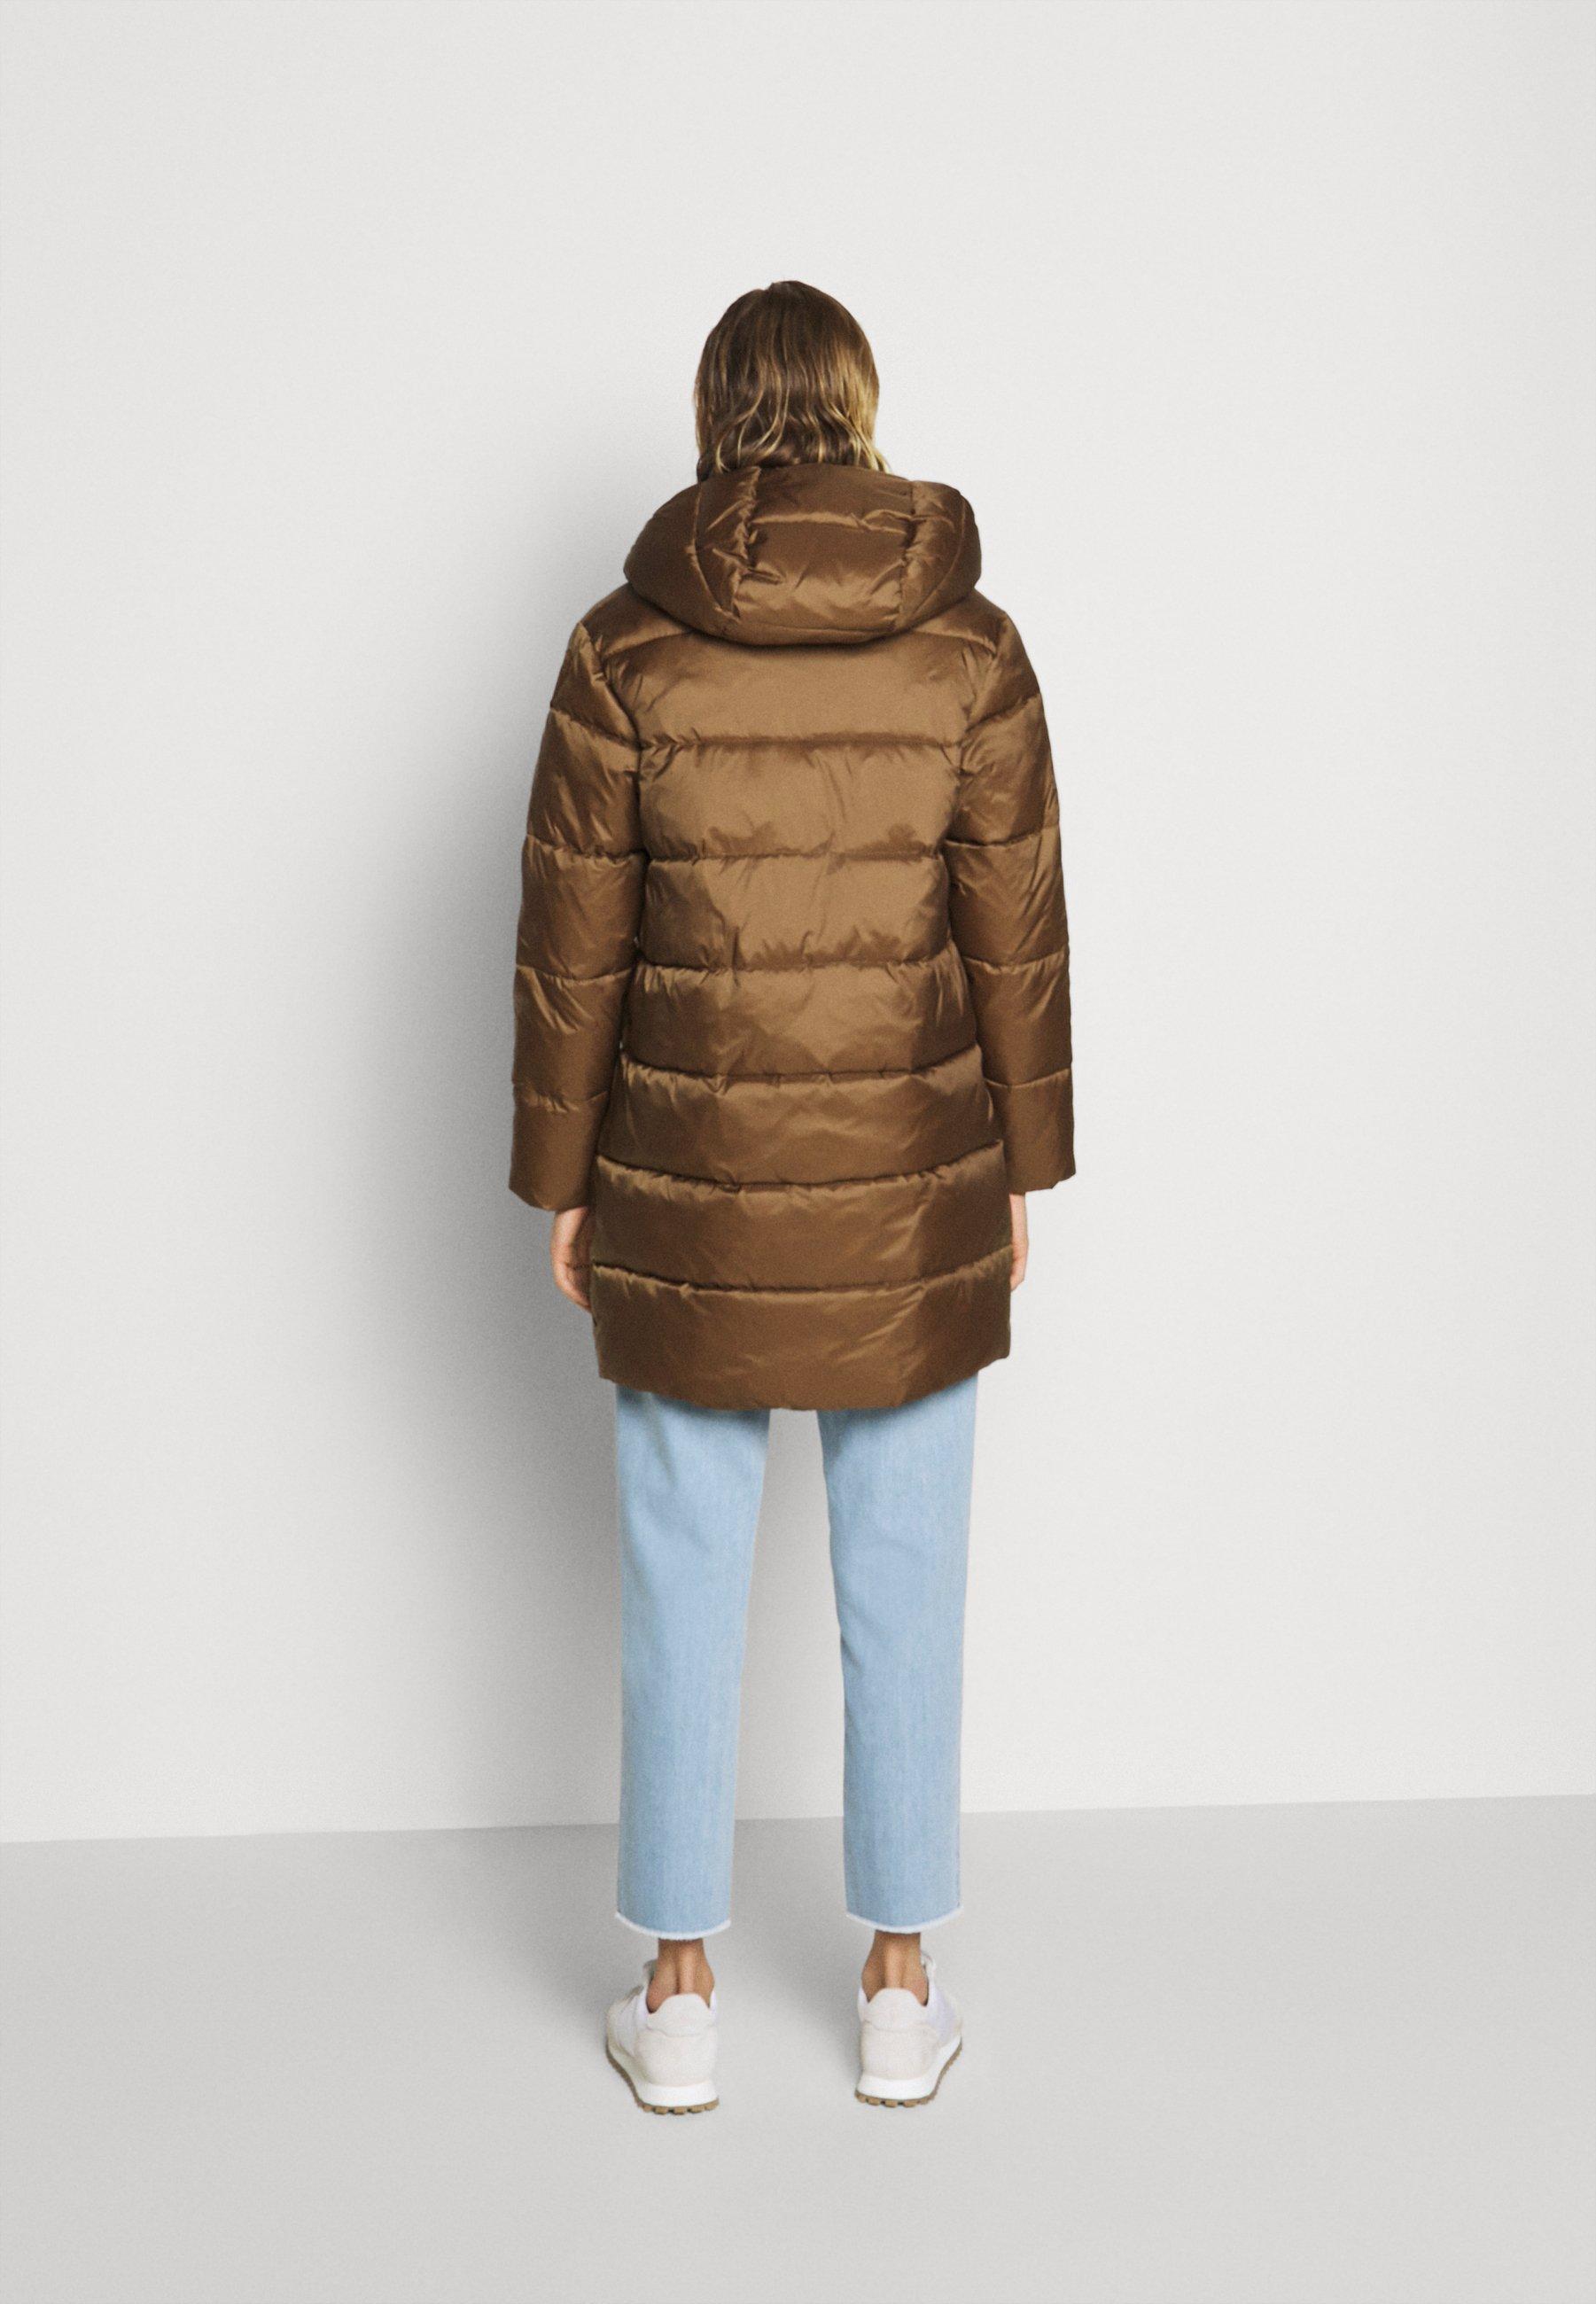 Blauer IMPERMEABILE TRENCH LUNGHI OVATTA - Veste d'hiver - dachshund - Manteaux Femme qN6ZW